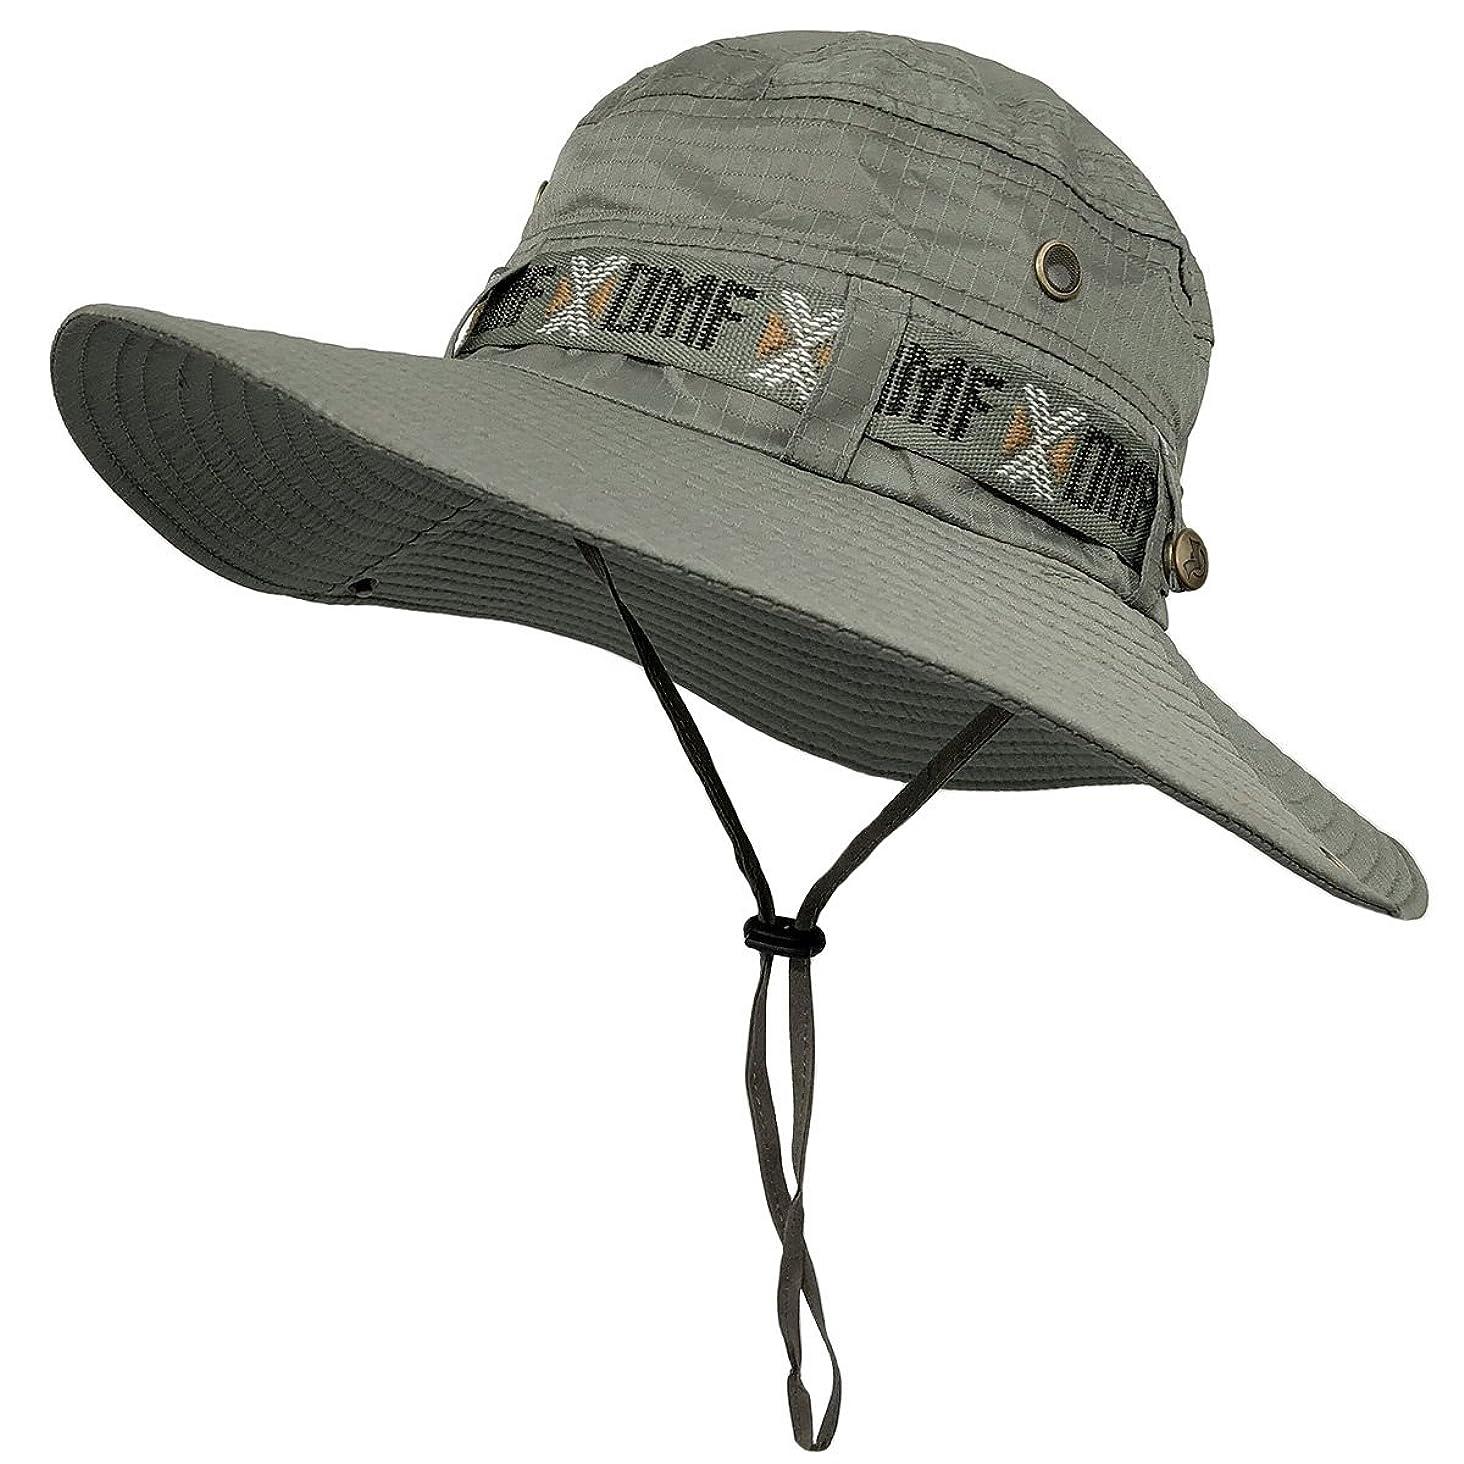 LETHMIK Fishing Sun Boonie Hat Waterproof Summer UV Protection Safari Cap Outdoor Hunting Hat